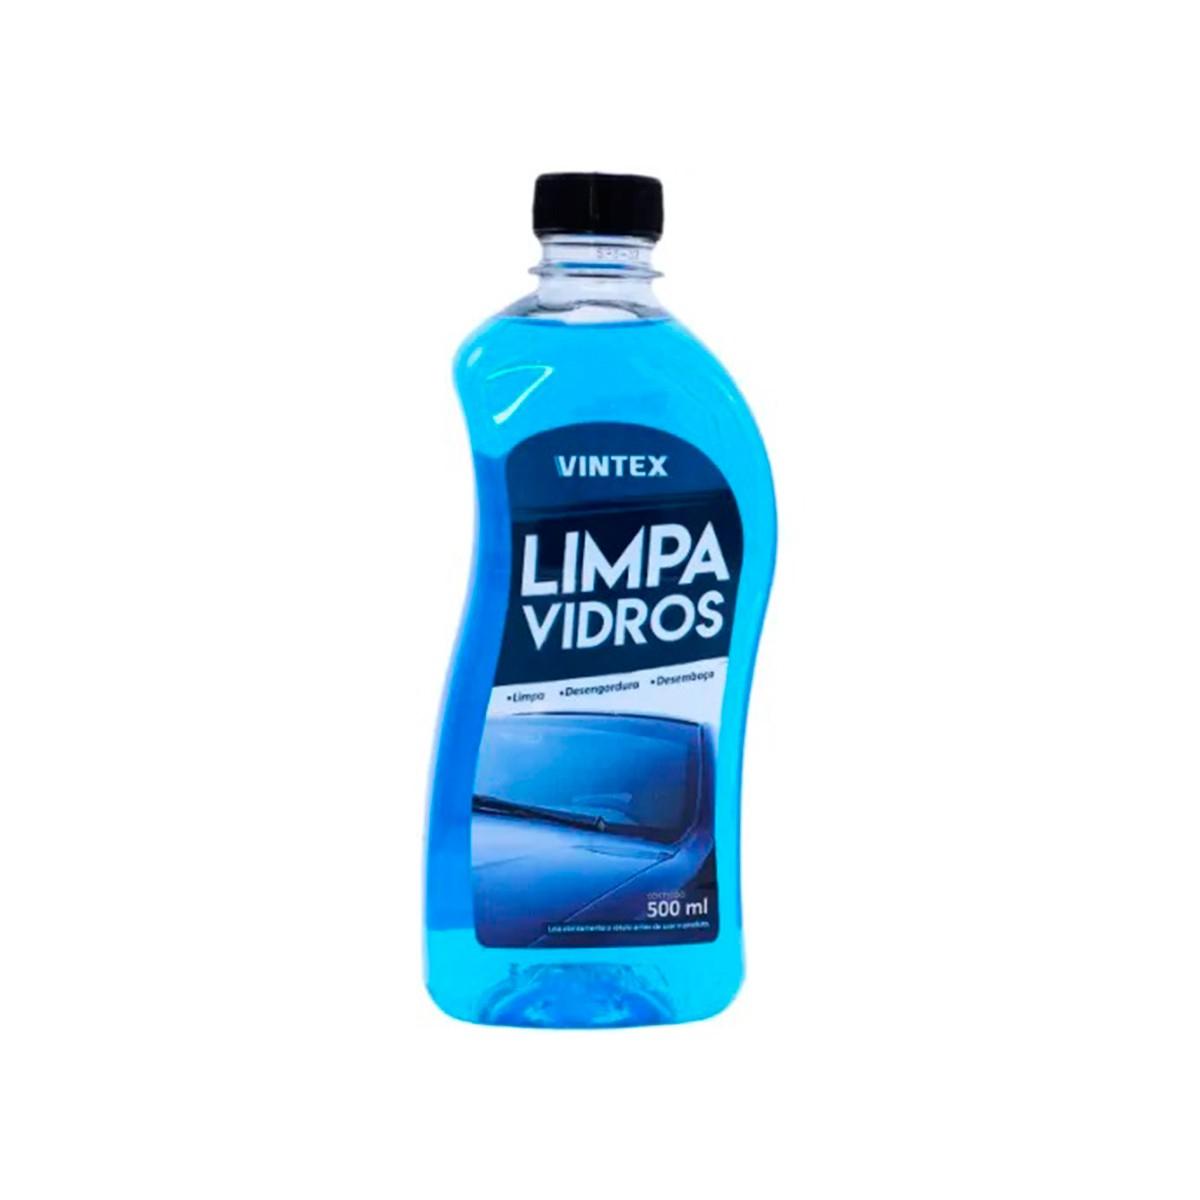 Limpa Vidros Refil 500ml - Vonixx